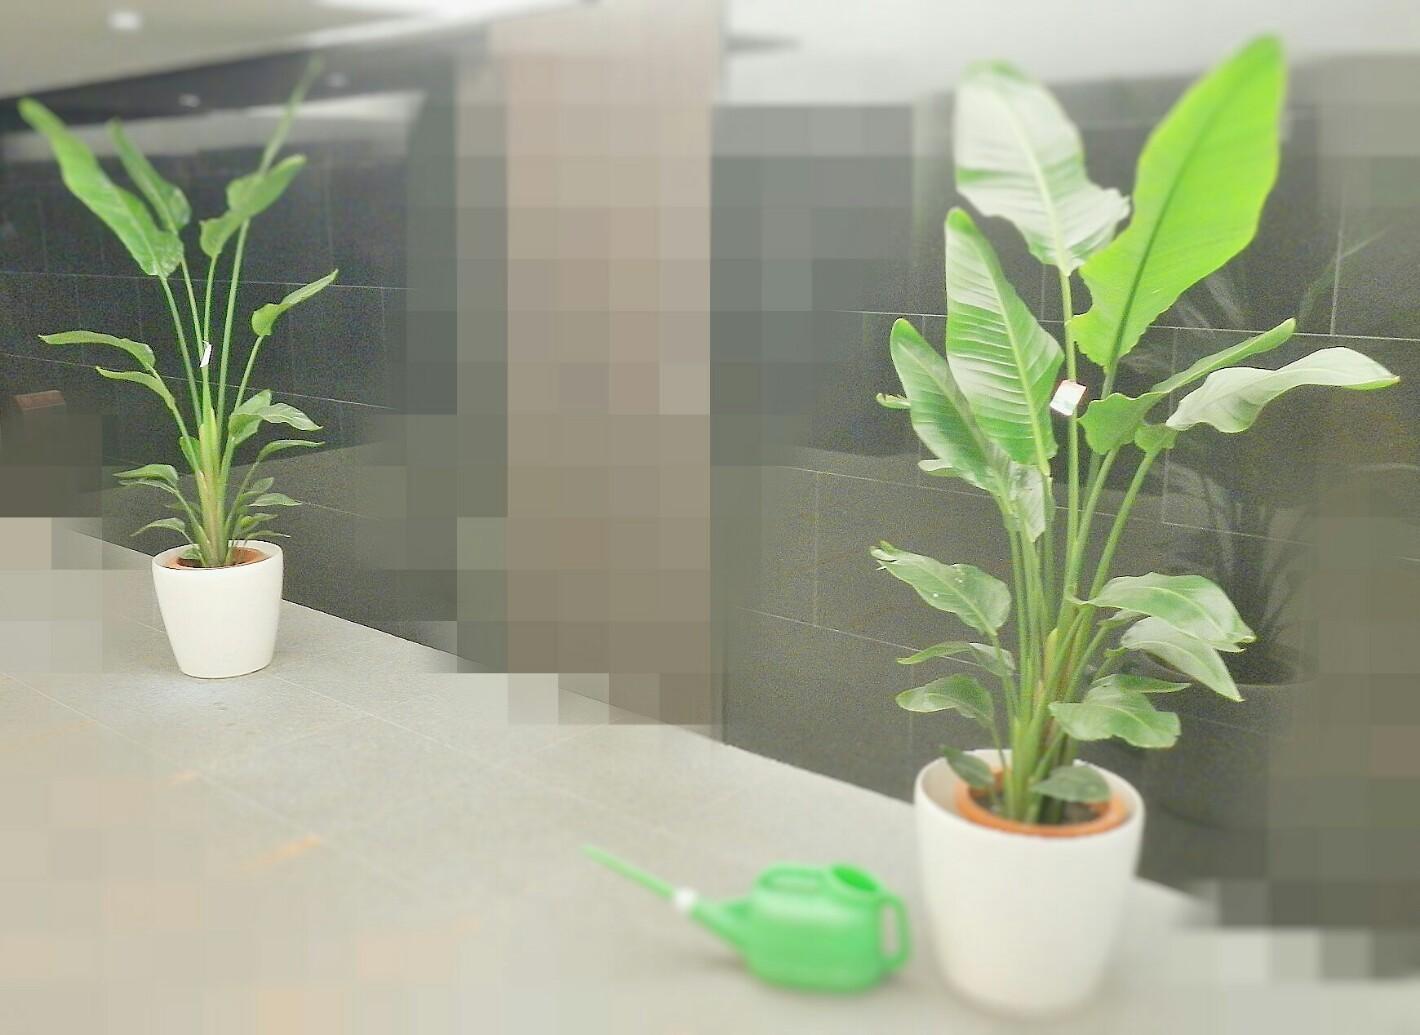 定期 観葉植物換え Before